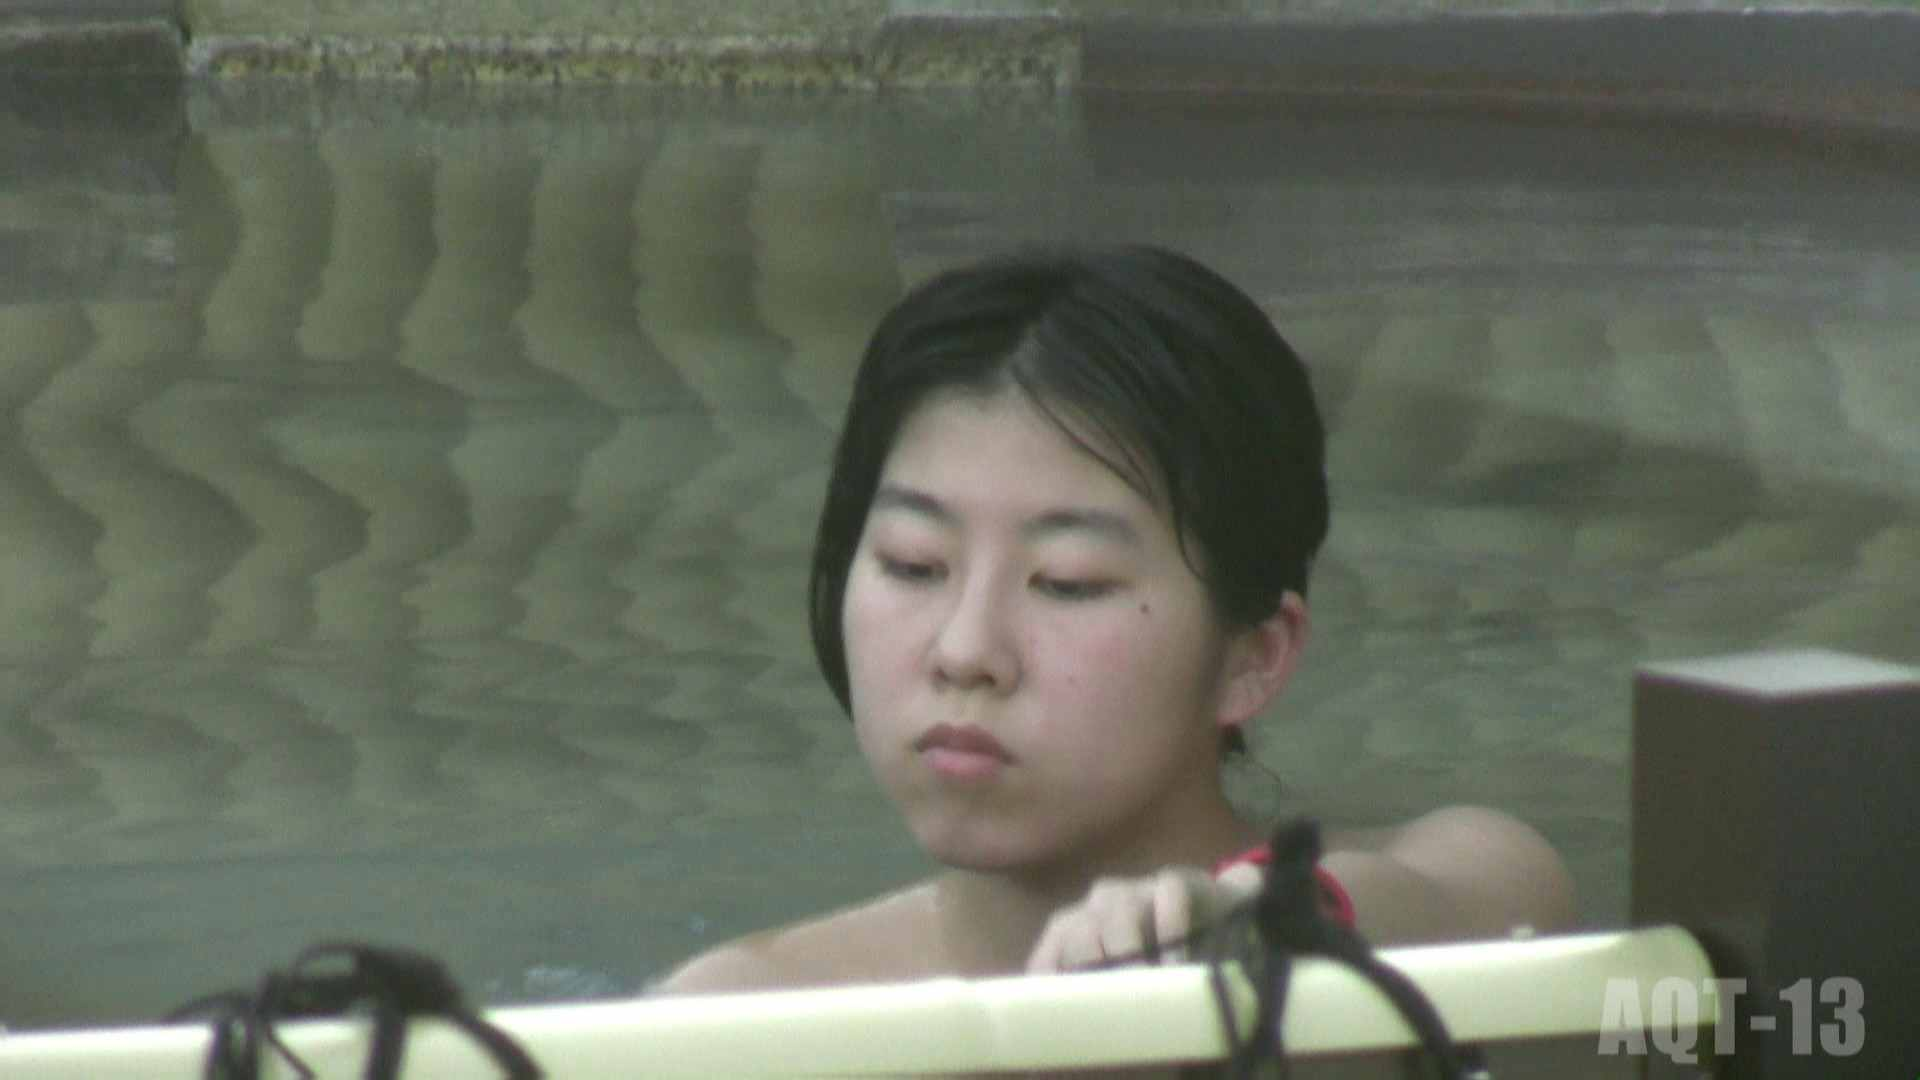 Aquaな露天風呂Vol.816 露天  53連発 34